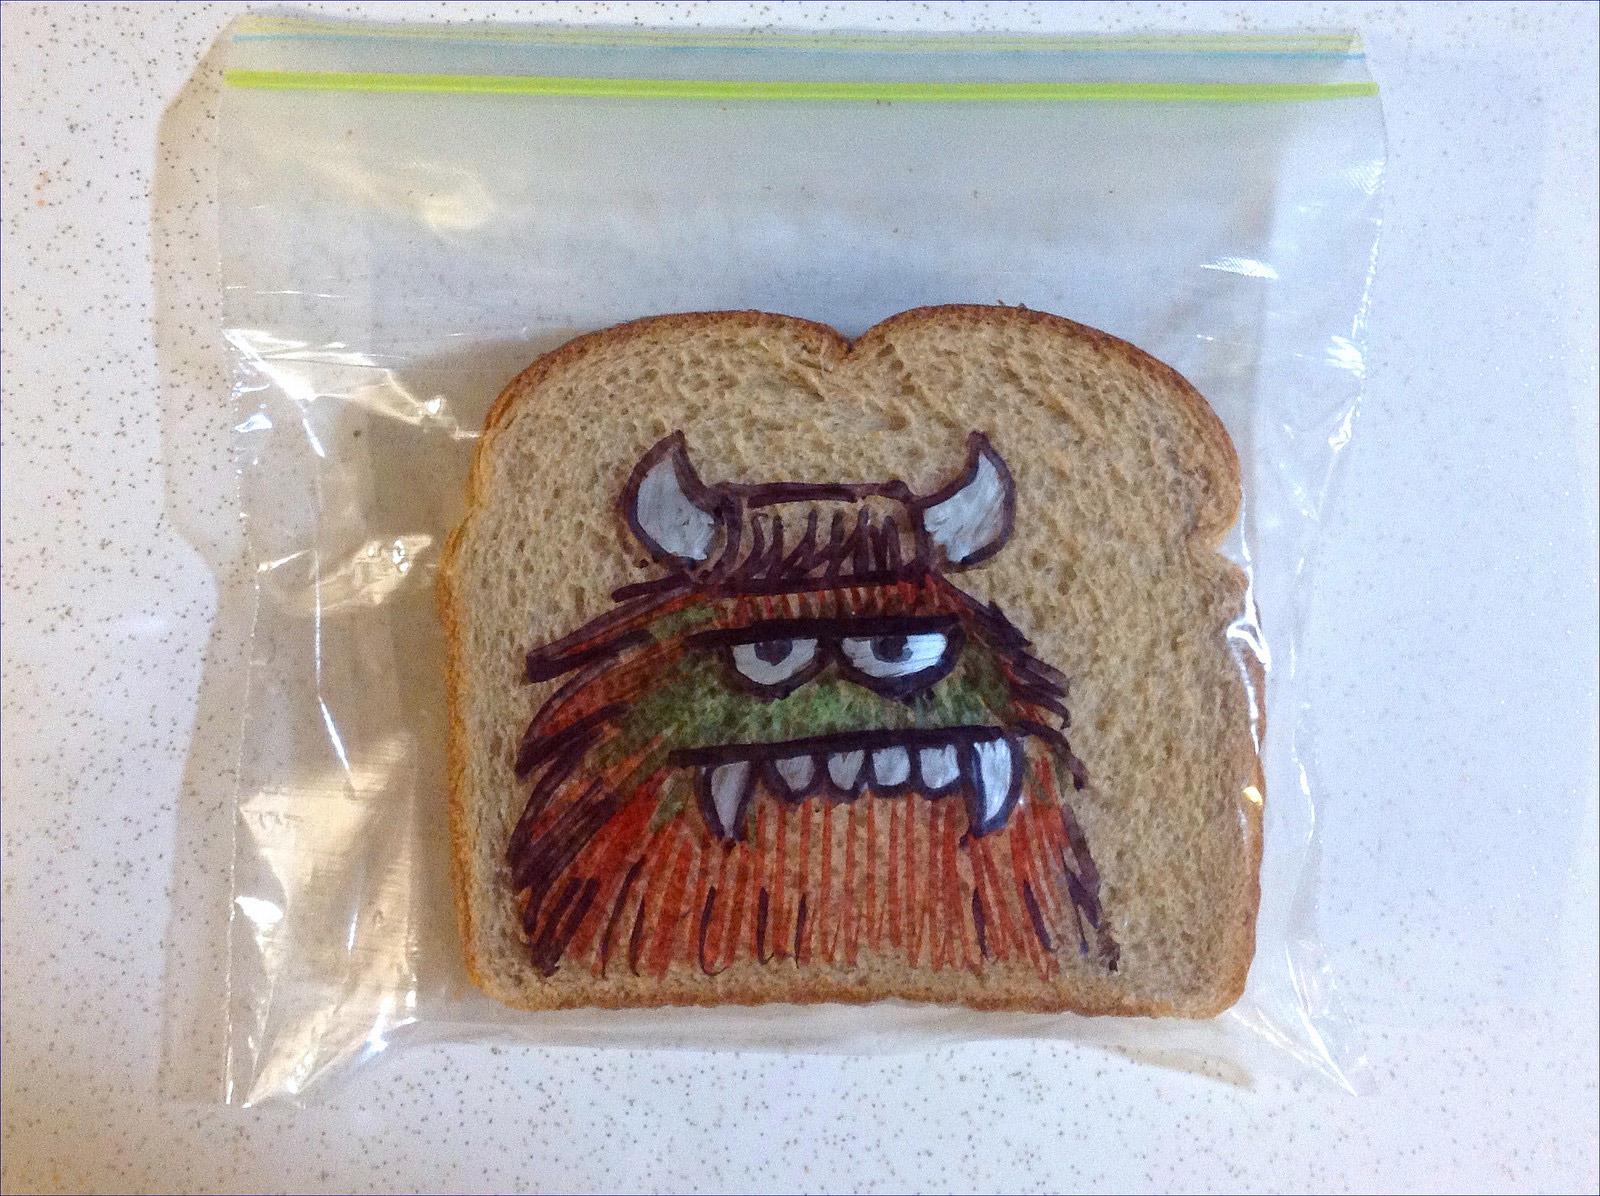 david-laferriere-creative-lunch-bag-illustration-16